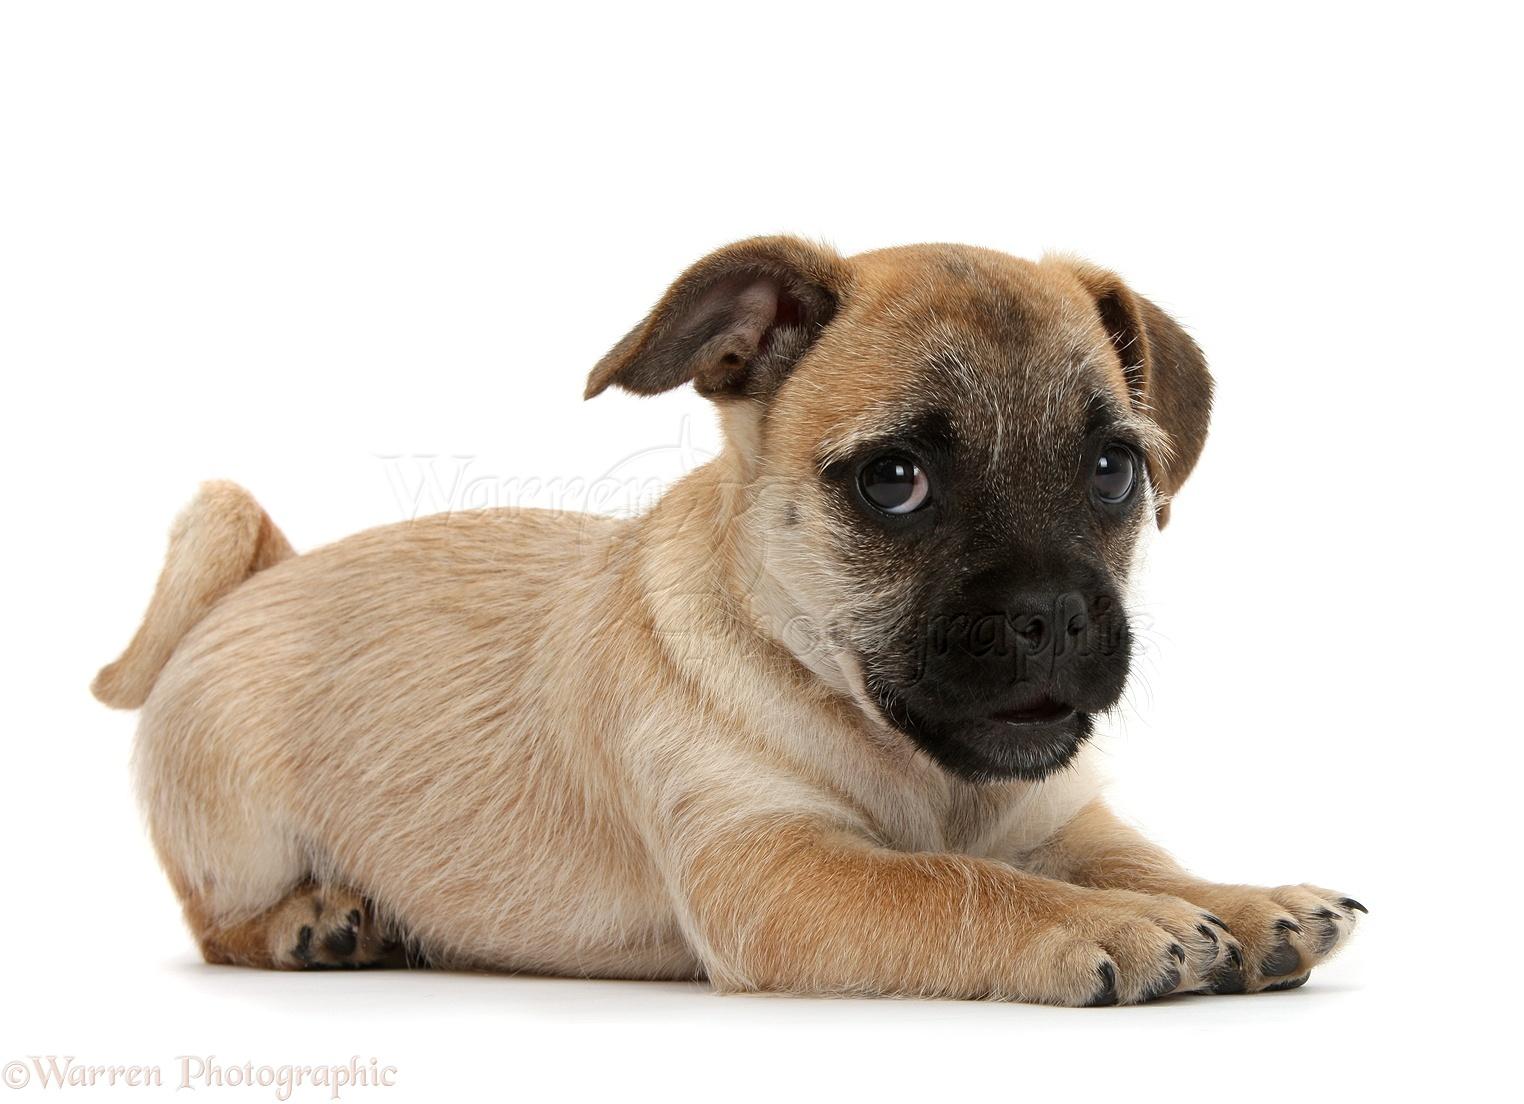 pics photos   jug dog jack russell pug cross a pug with a nose